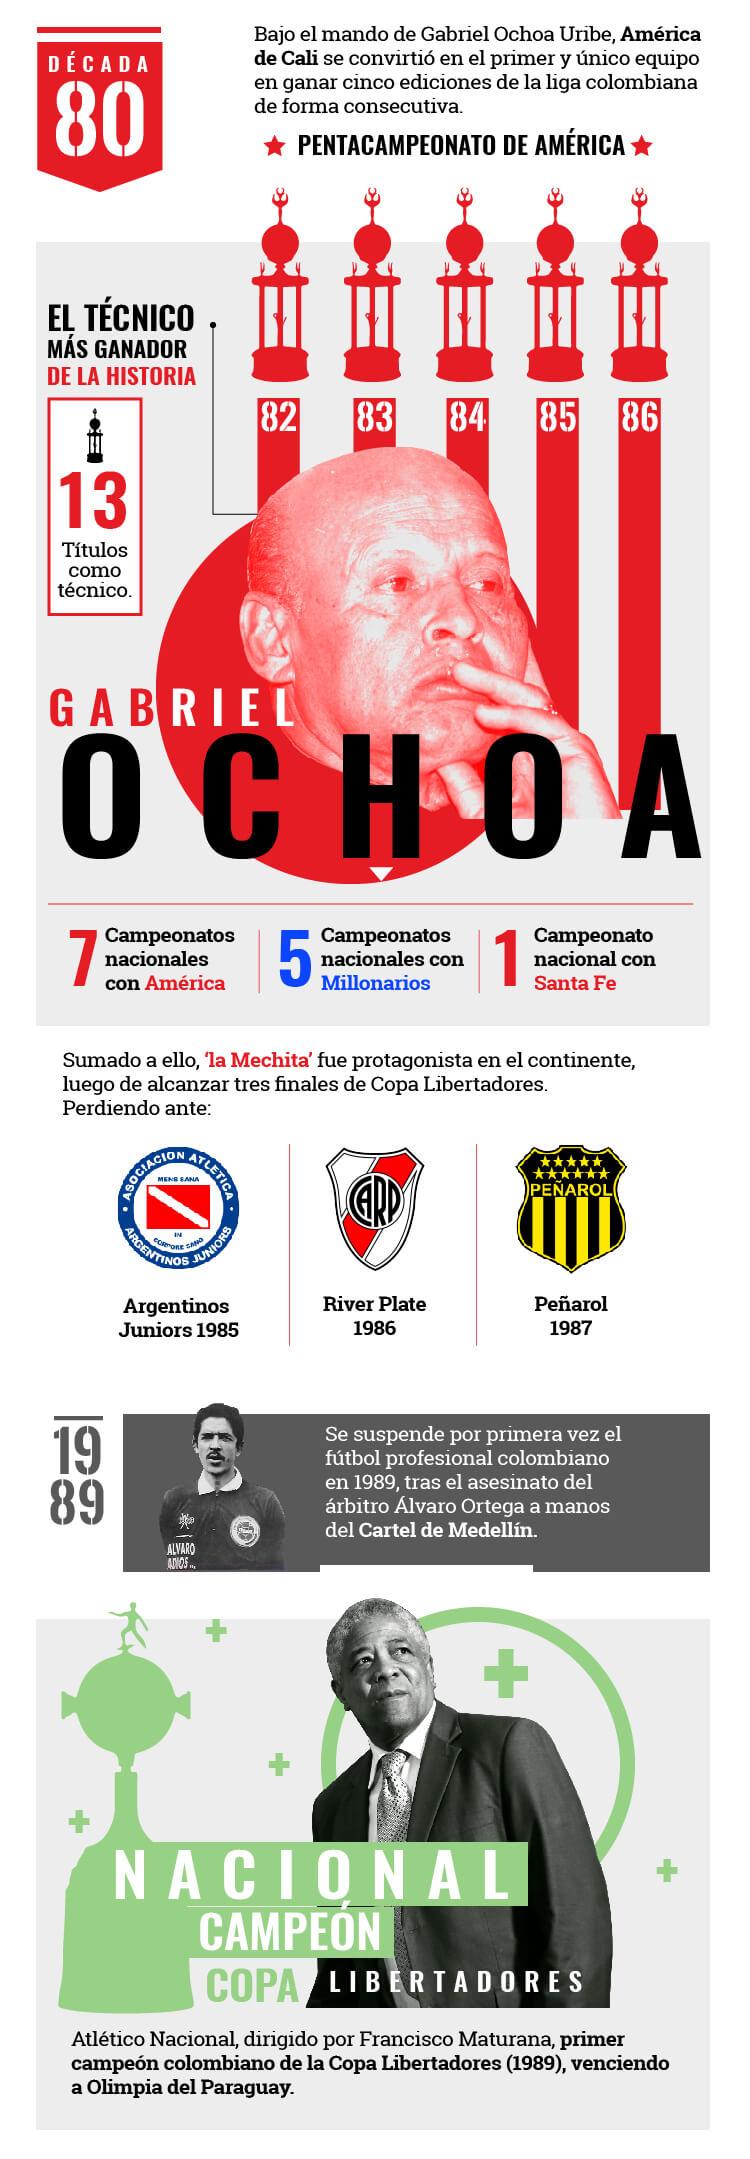 América perdió 4 finales y Nacional ganó la primera en Copa Libertadores